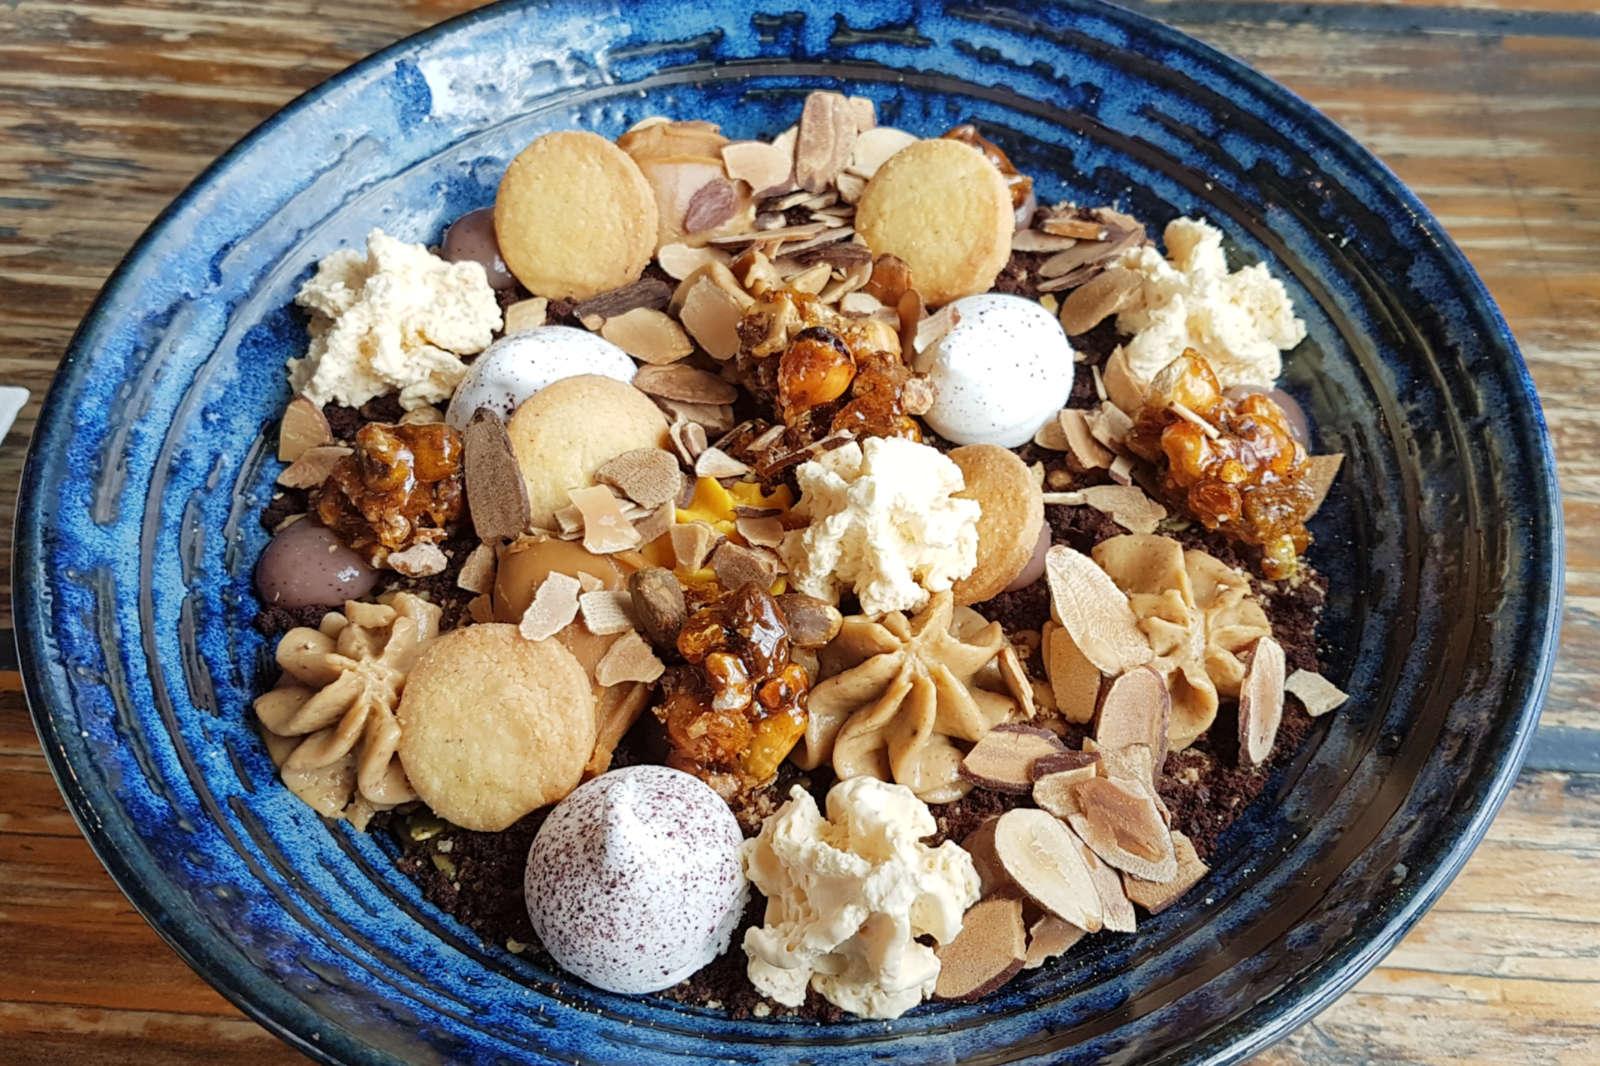 Coenes - overnight oats